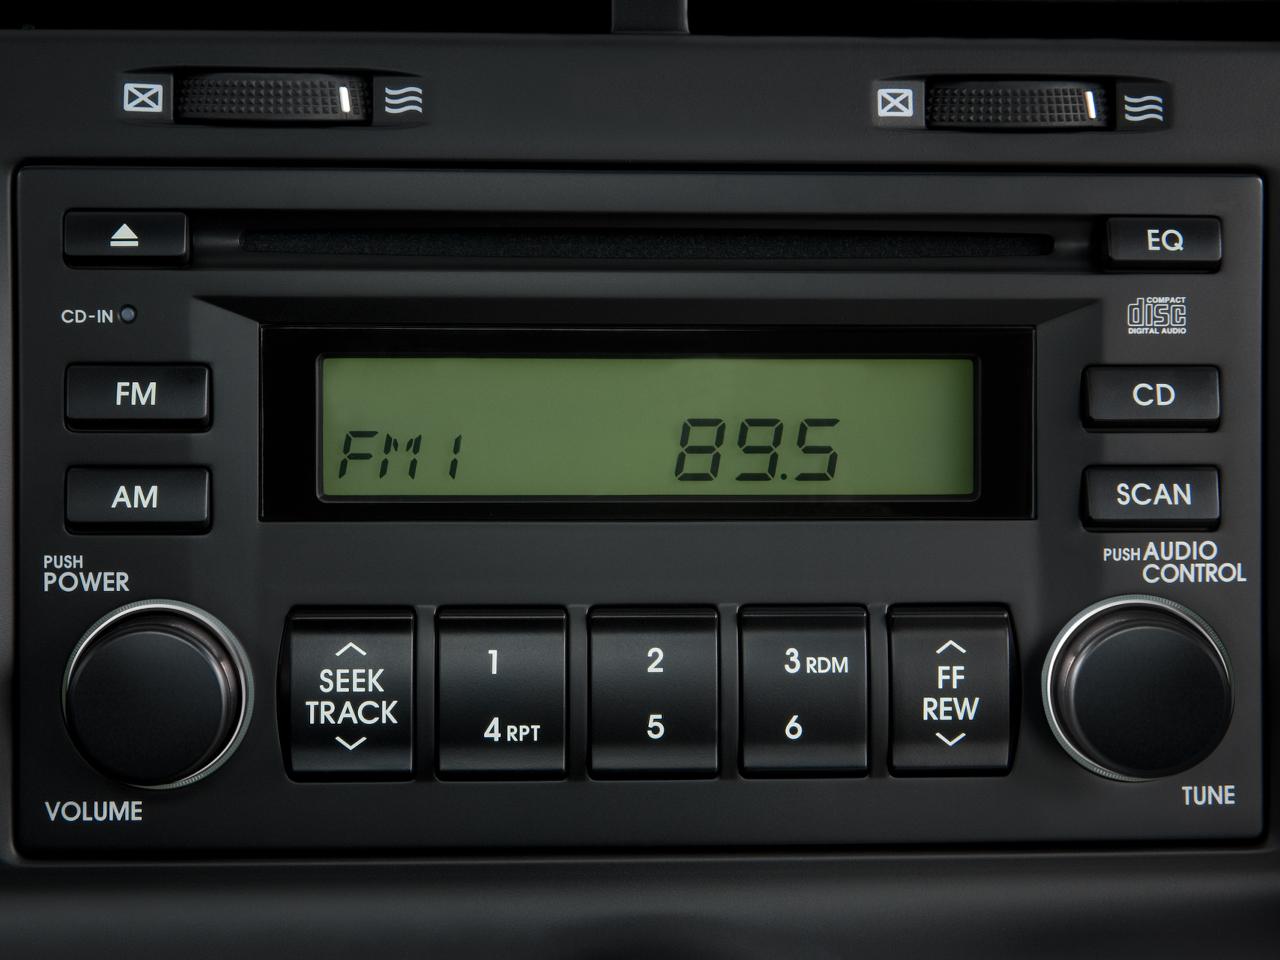 2008 Kia Sorento Stereo Wiring Diagrams Speaker Sportage Midsize Suv Review Automobile Magazine Rh Automobilemag Com Removal Harness